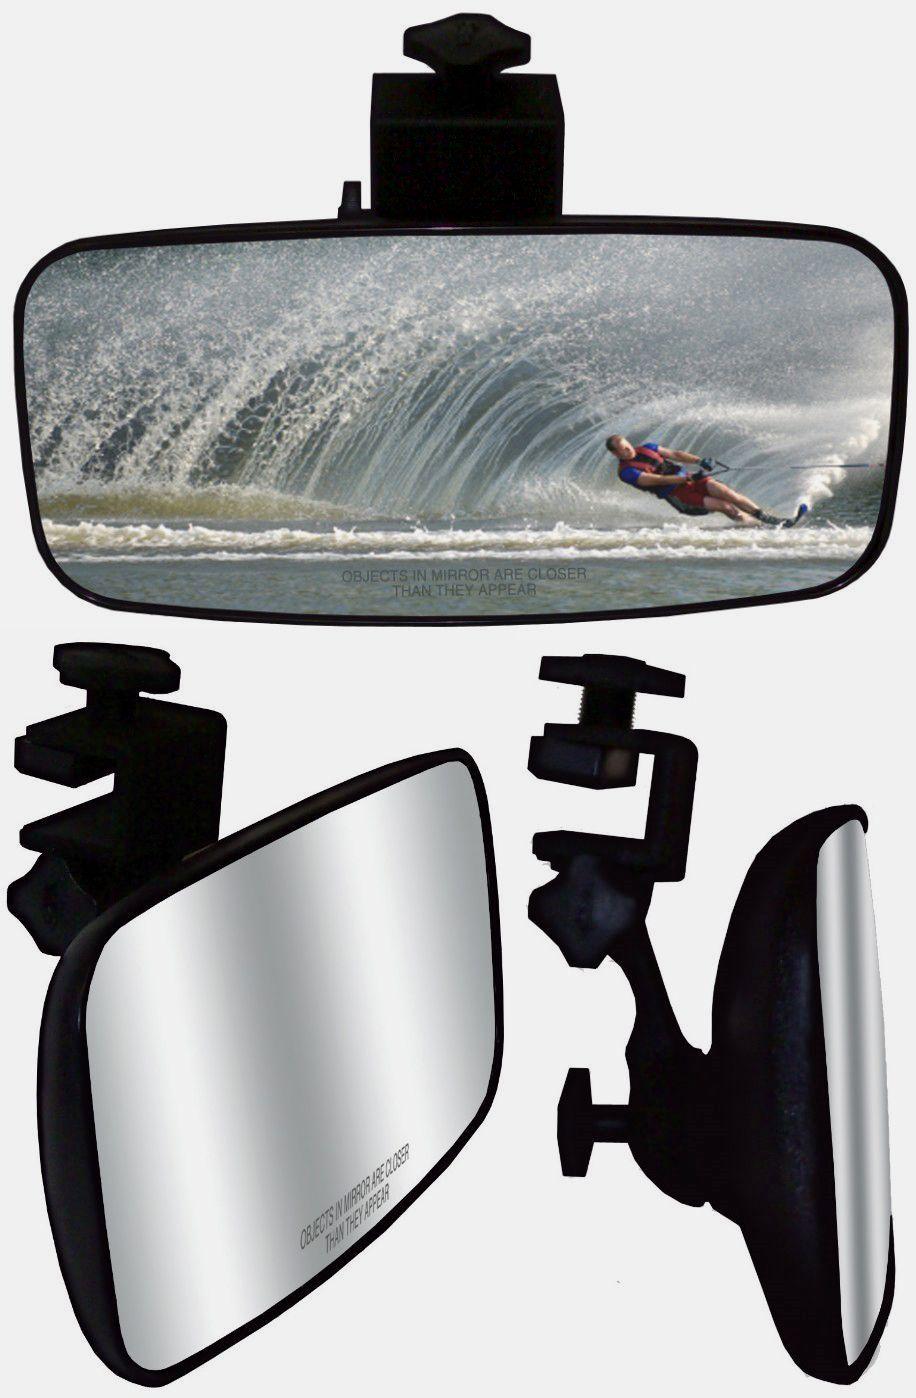 Boat Rear View Mirror Marine Nautical Safety Water Ski Boat Mirror Dashboard New